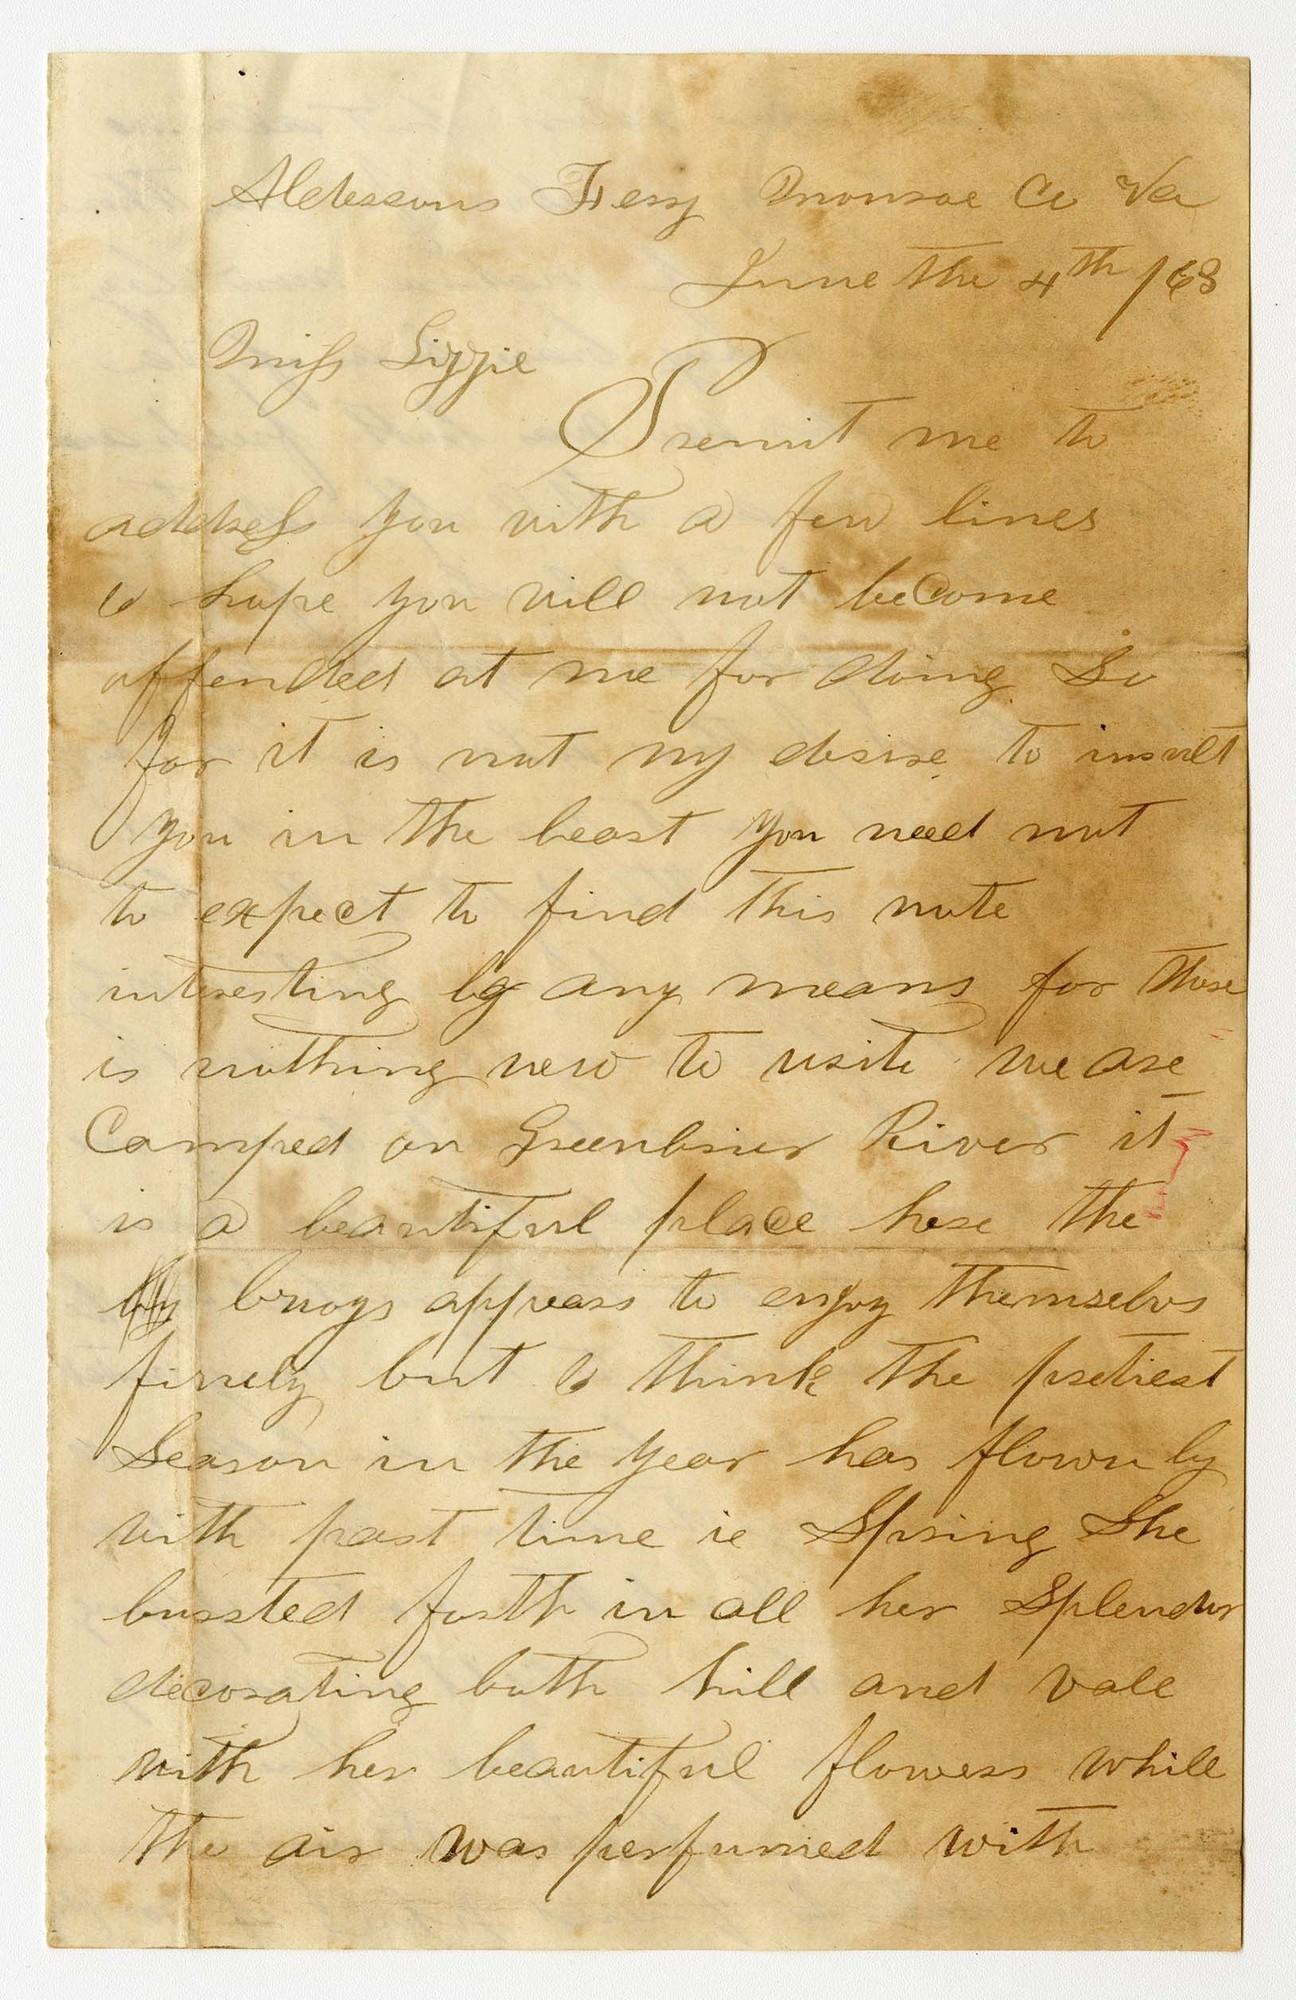 Ms1996_008_CarpenterHenryC_Letter_1862_0604a.jpg